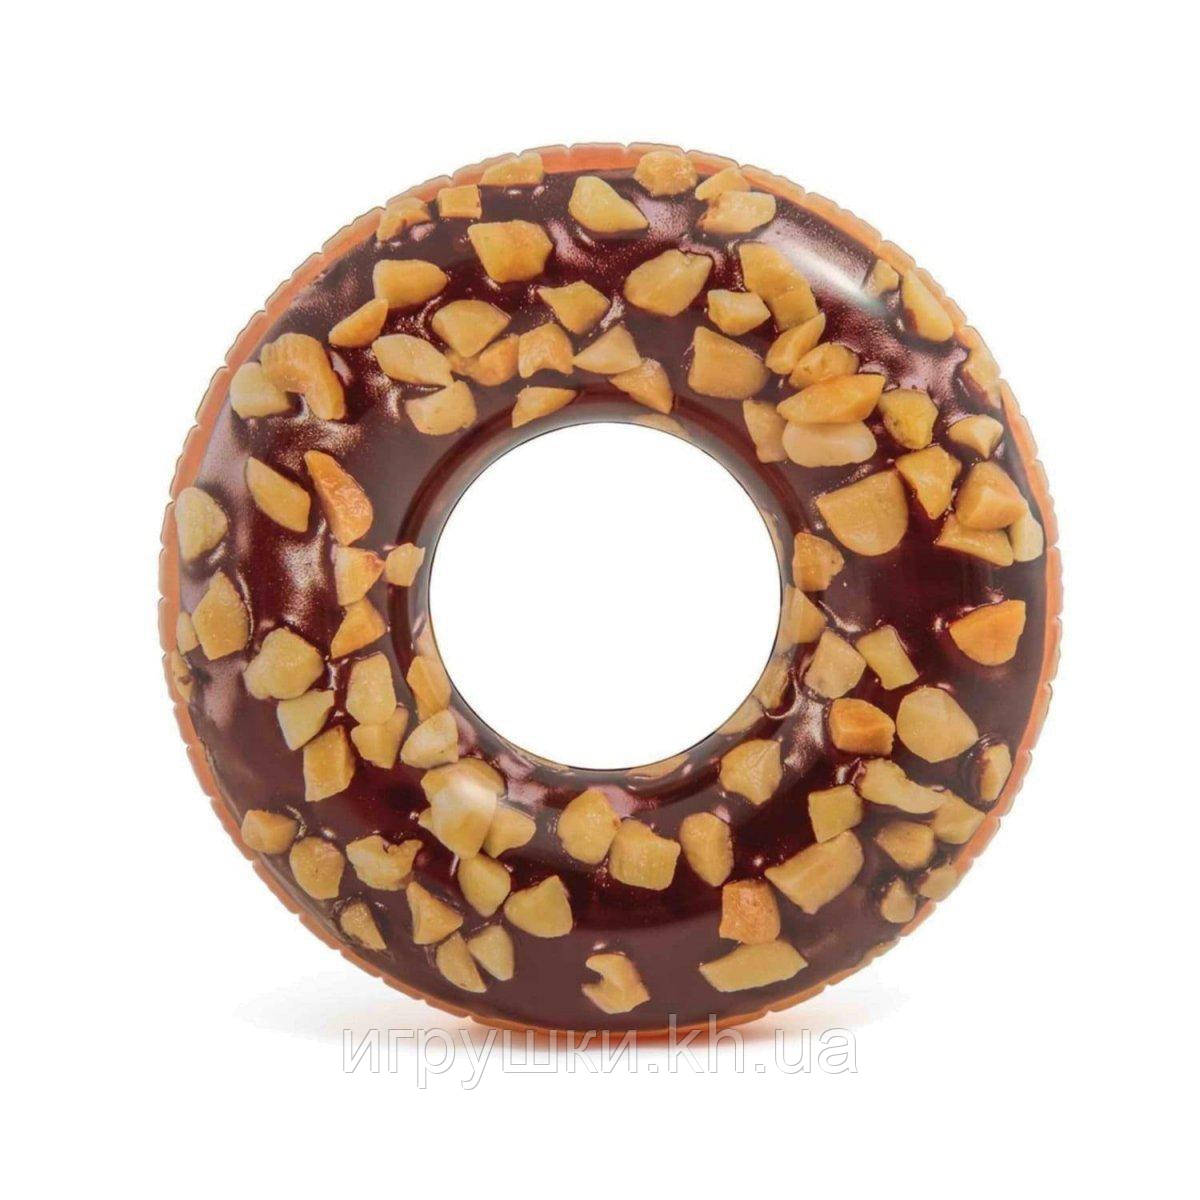 Intex надувний круг 56262 «Шоколадний пончик», 114 см